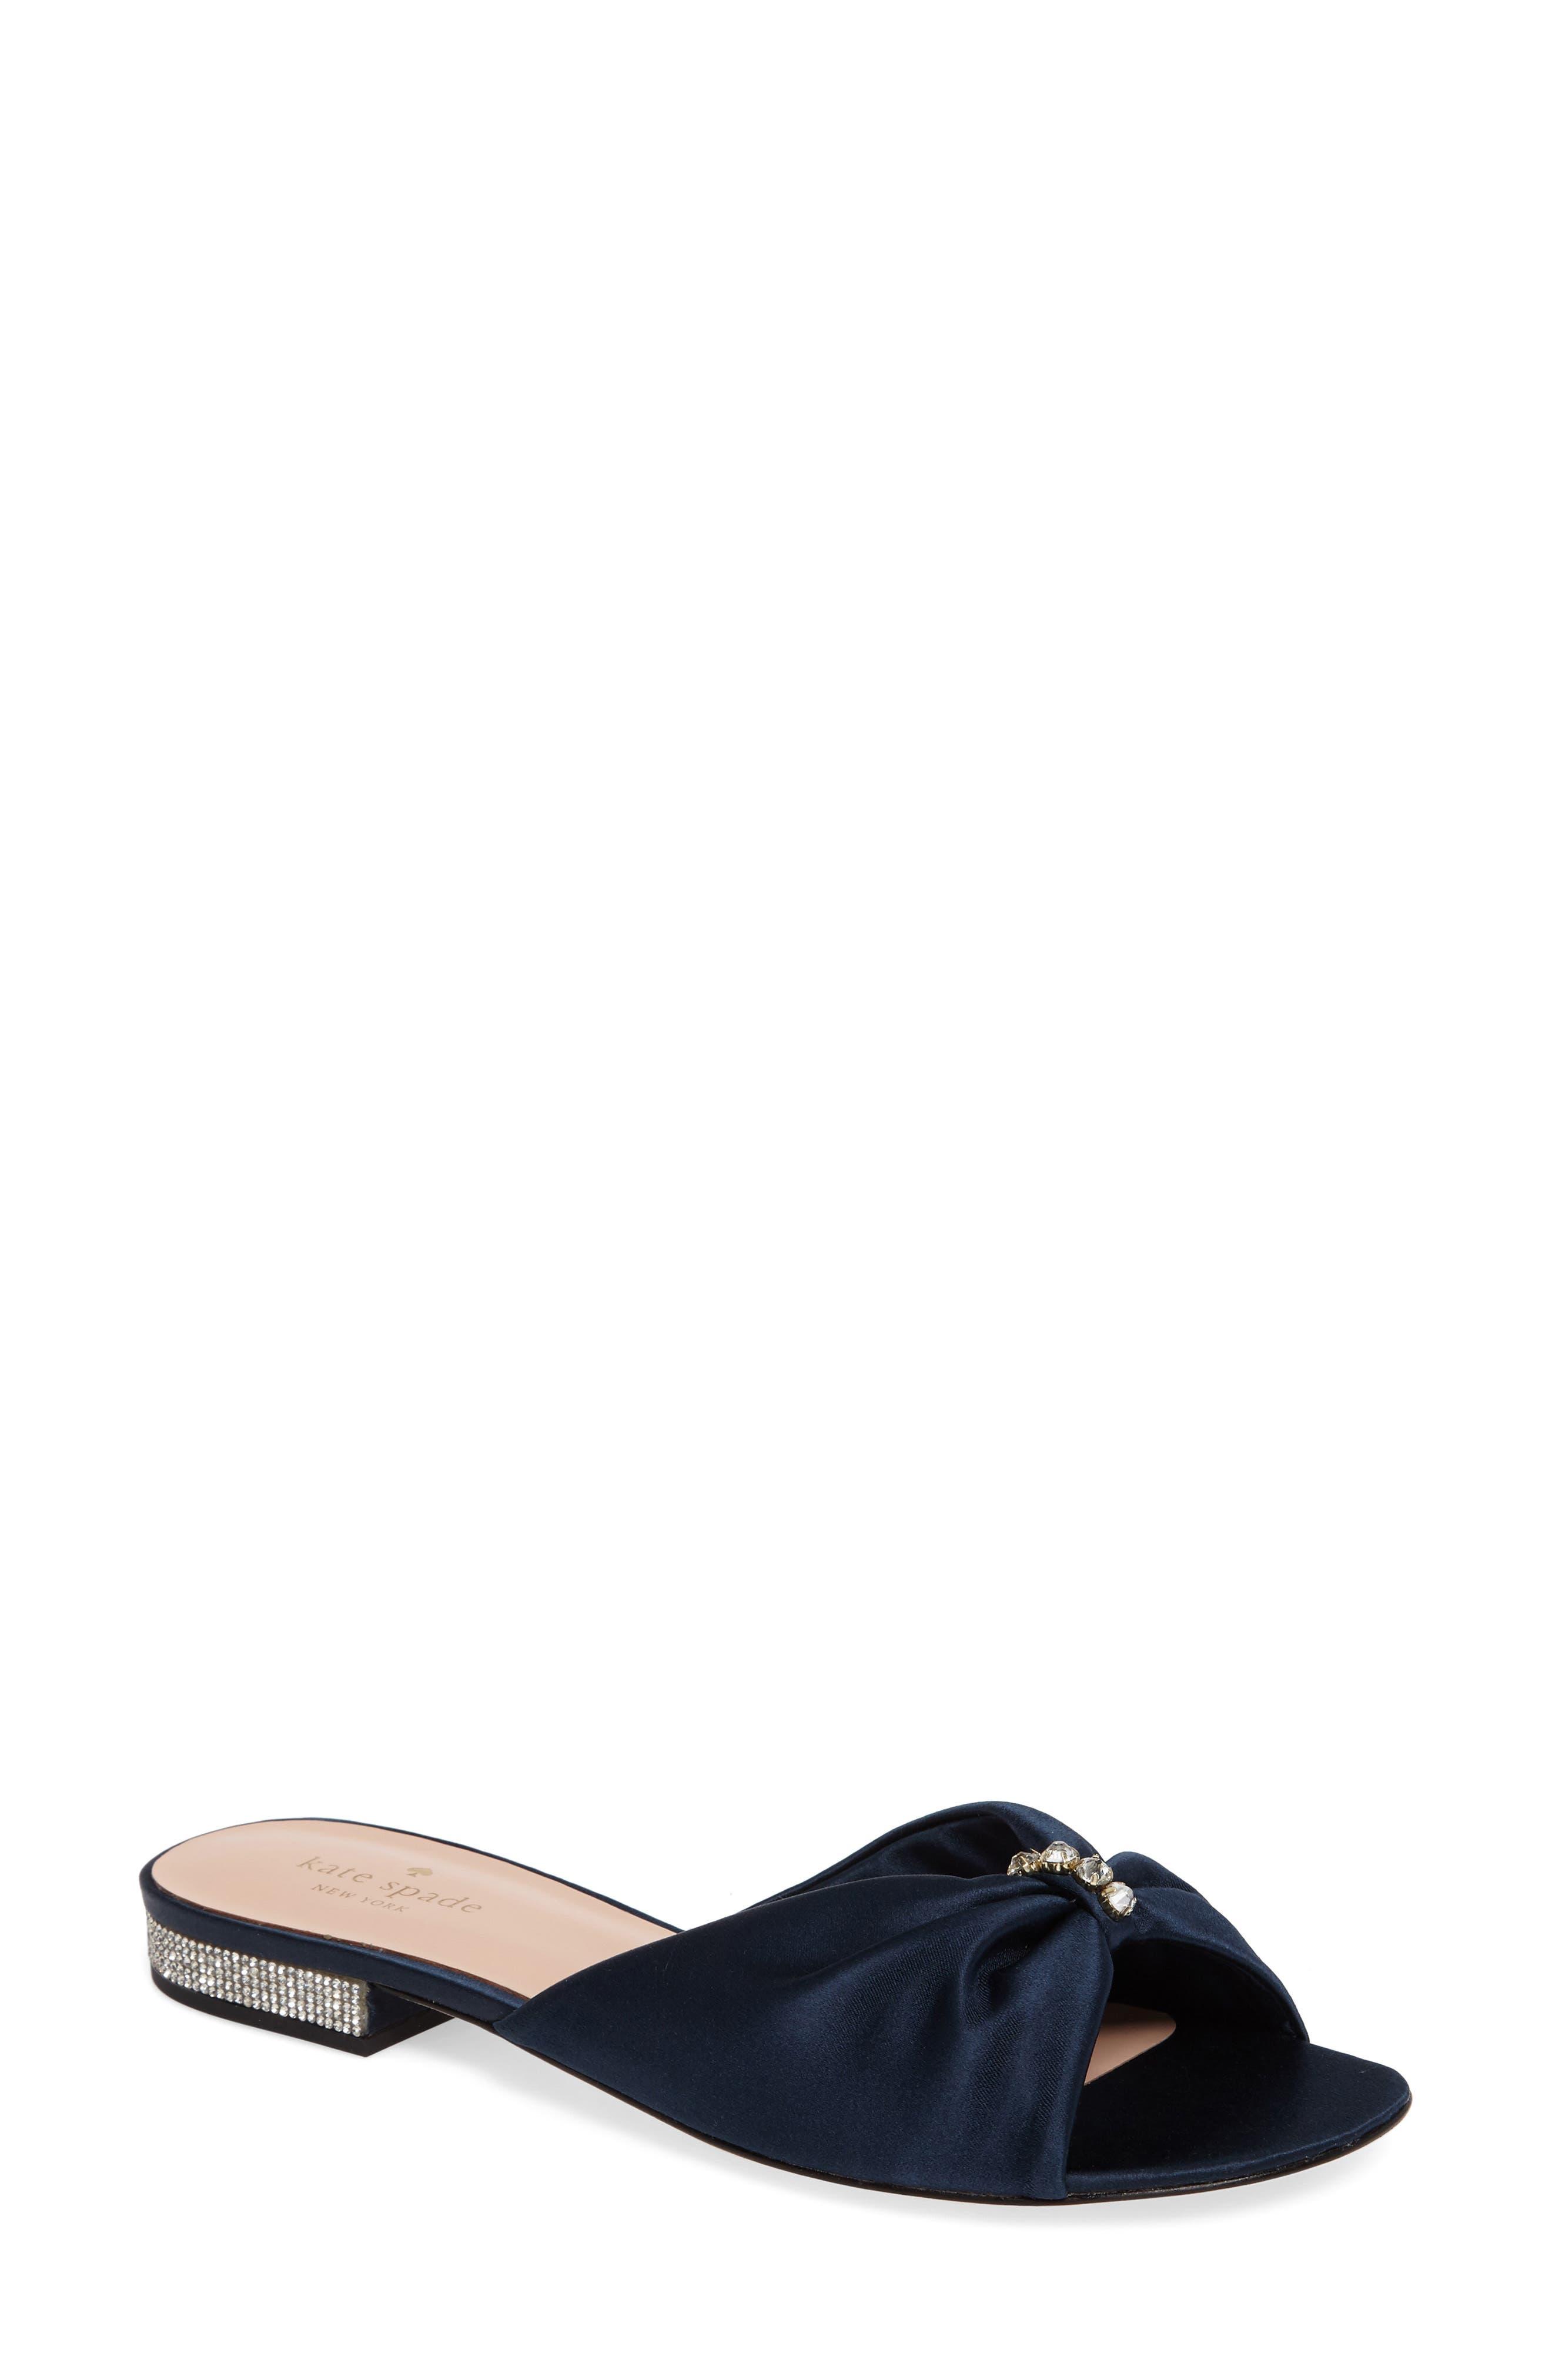 fenton slide sandal,                         Main,                         color, 475